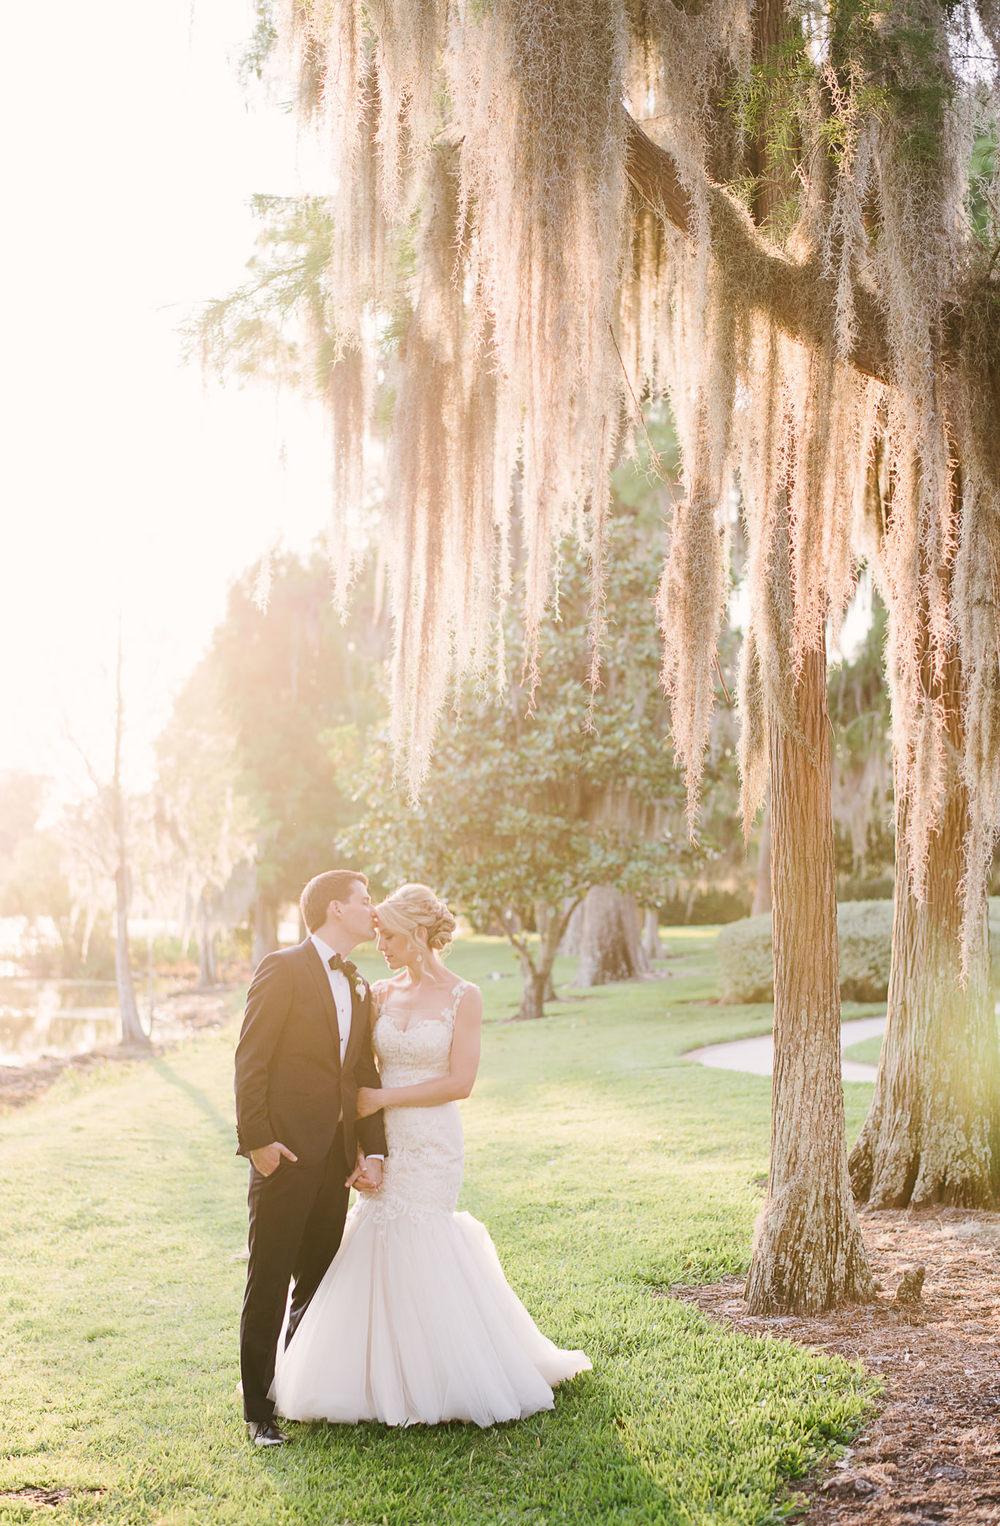 Mossy Cypress Trees Wedding